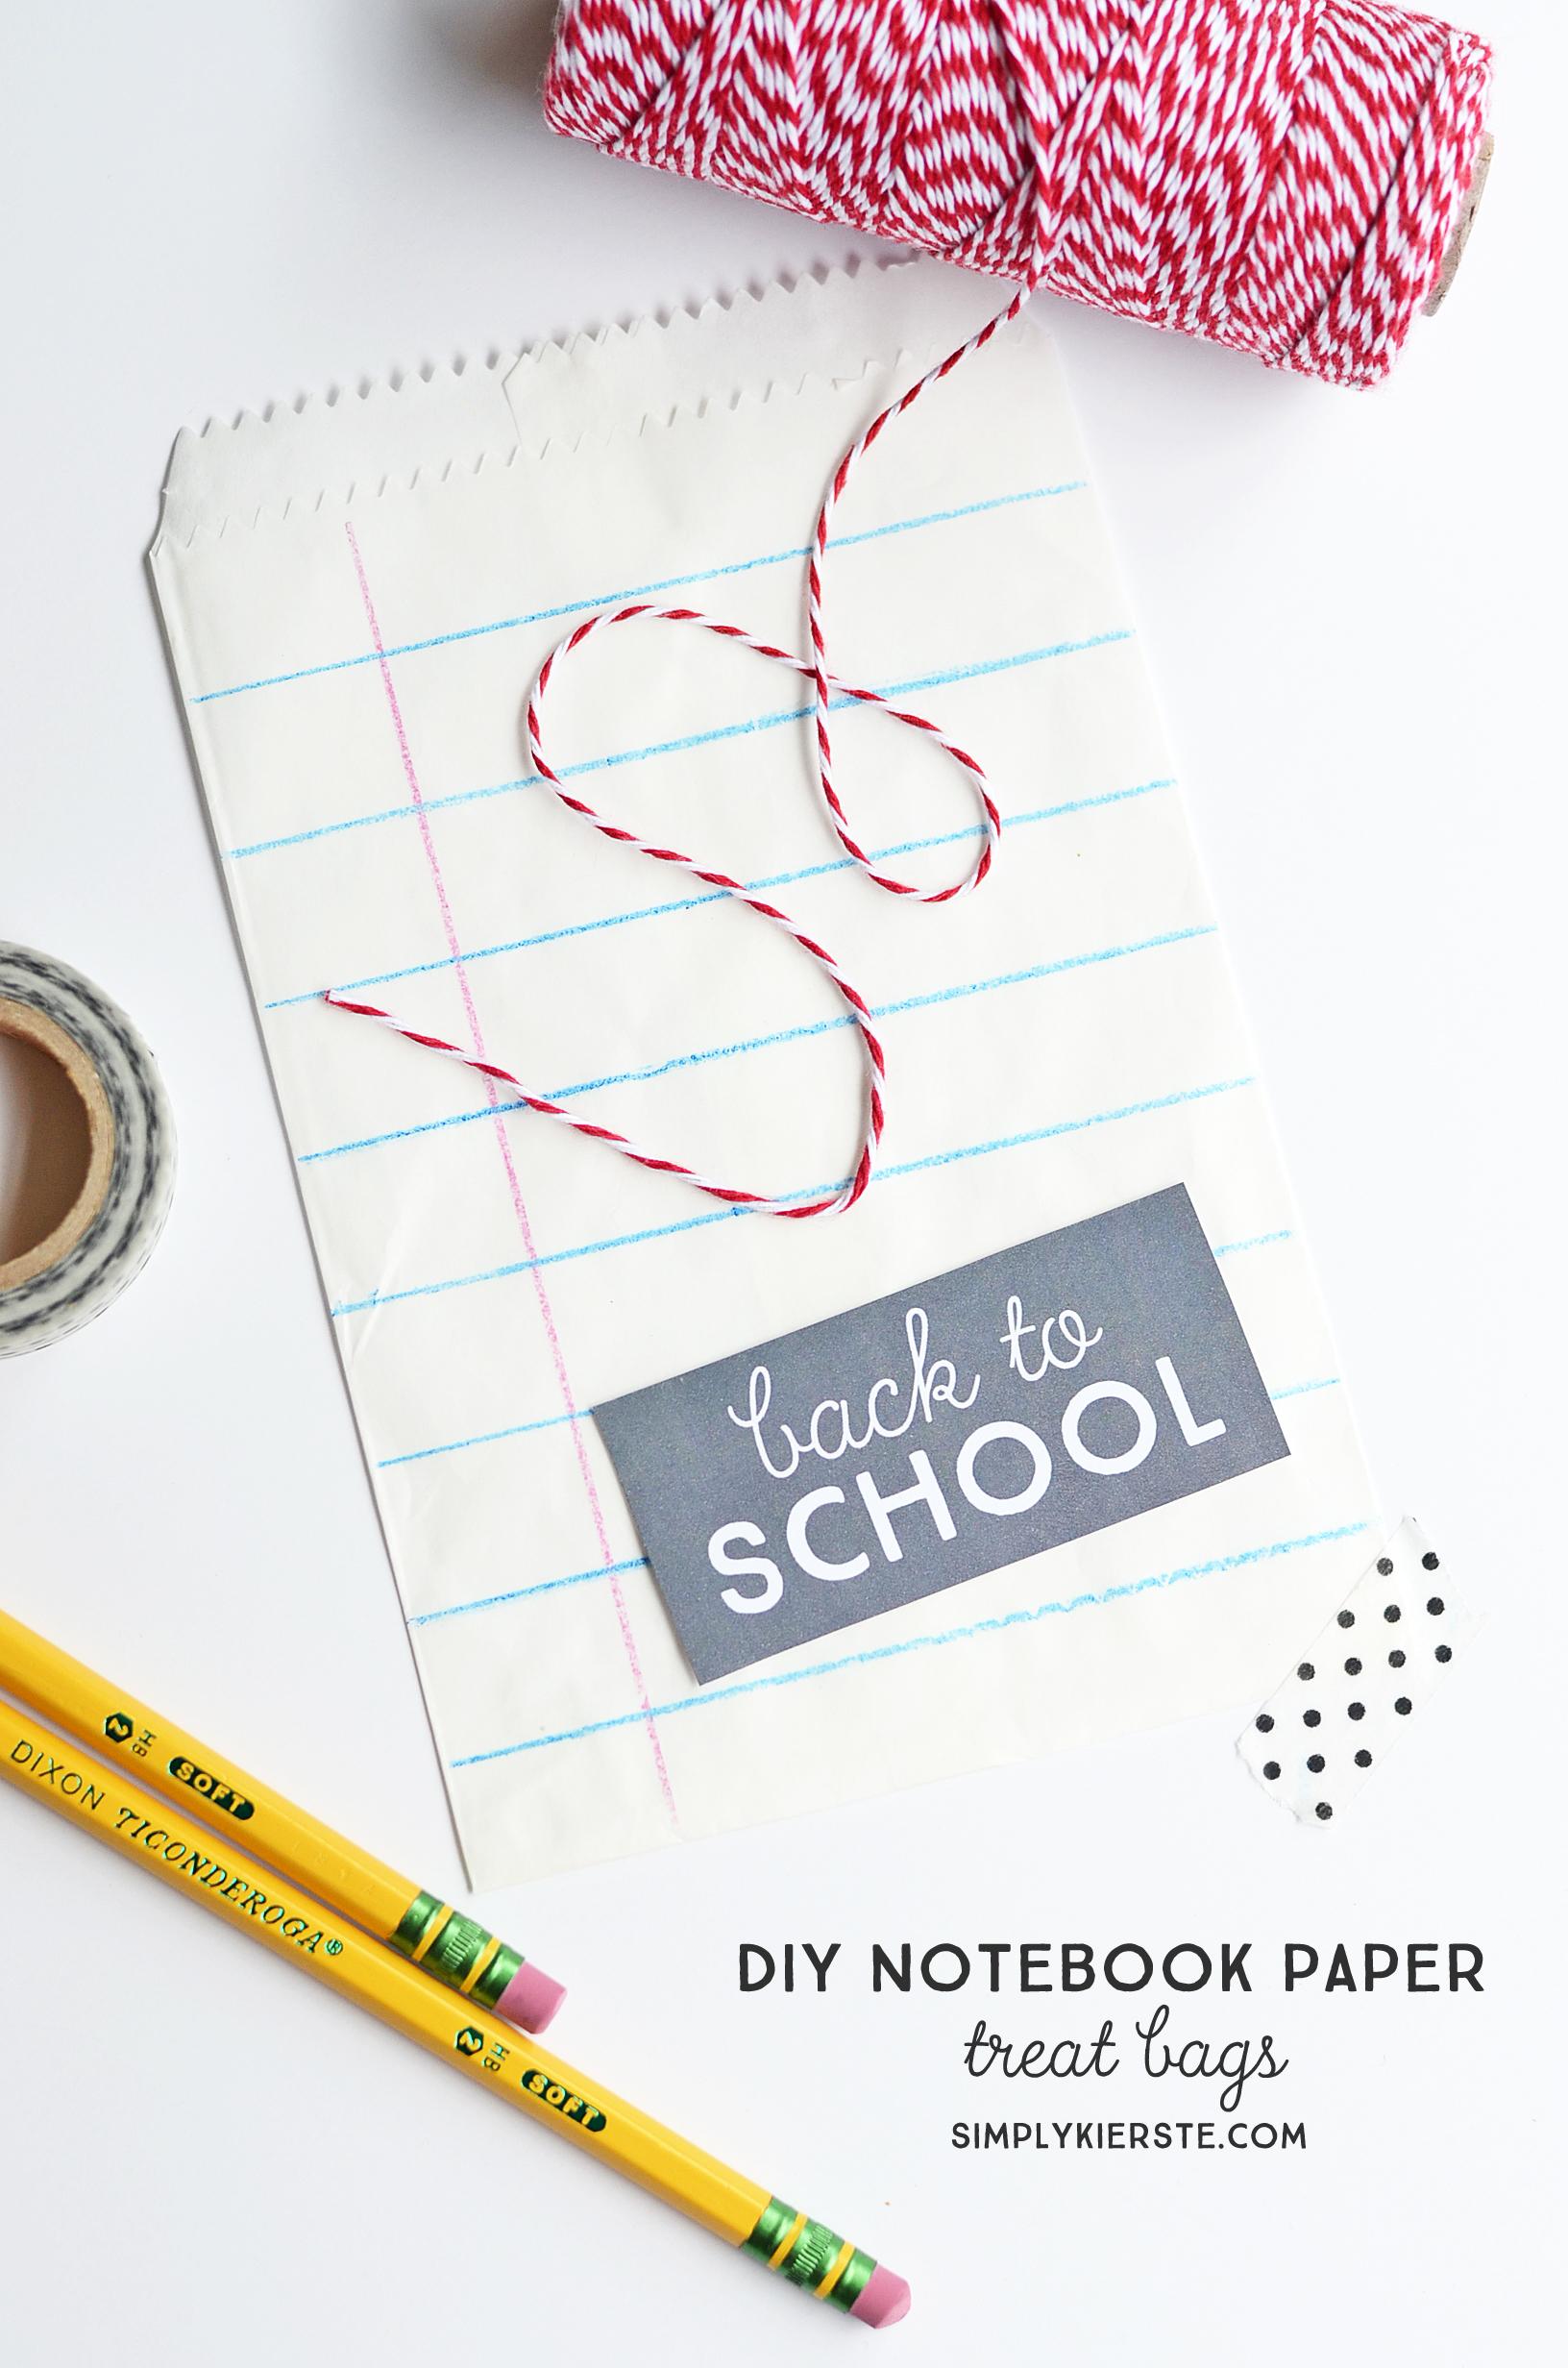 DIY notebook paper treat bags